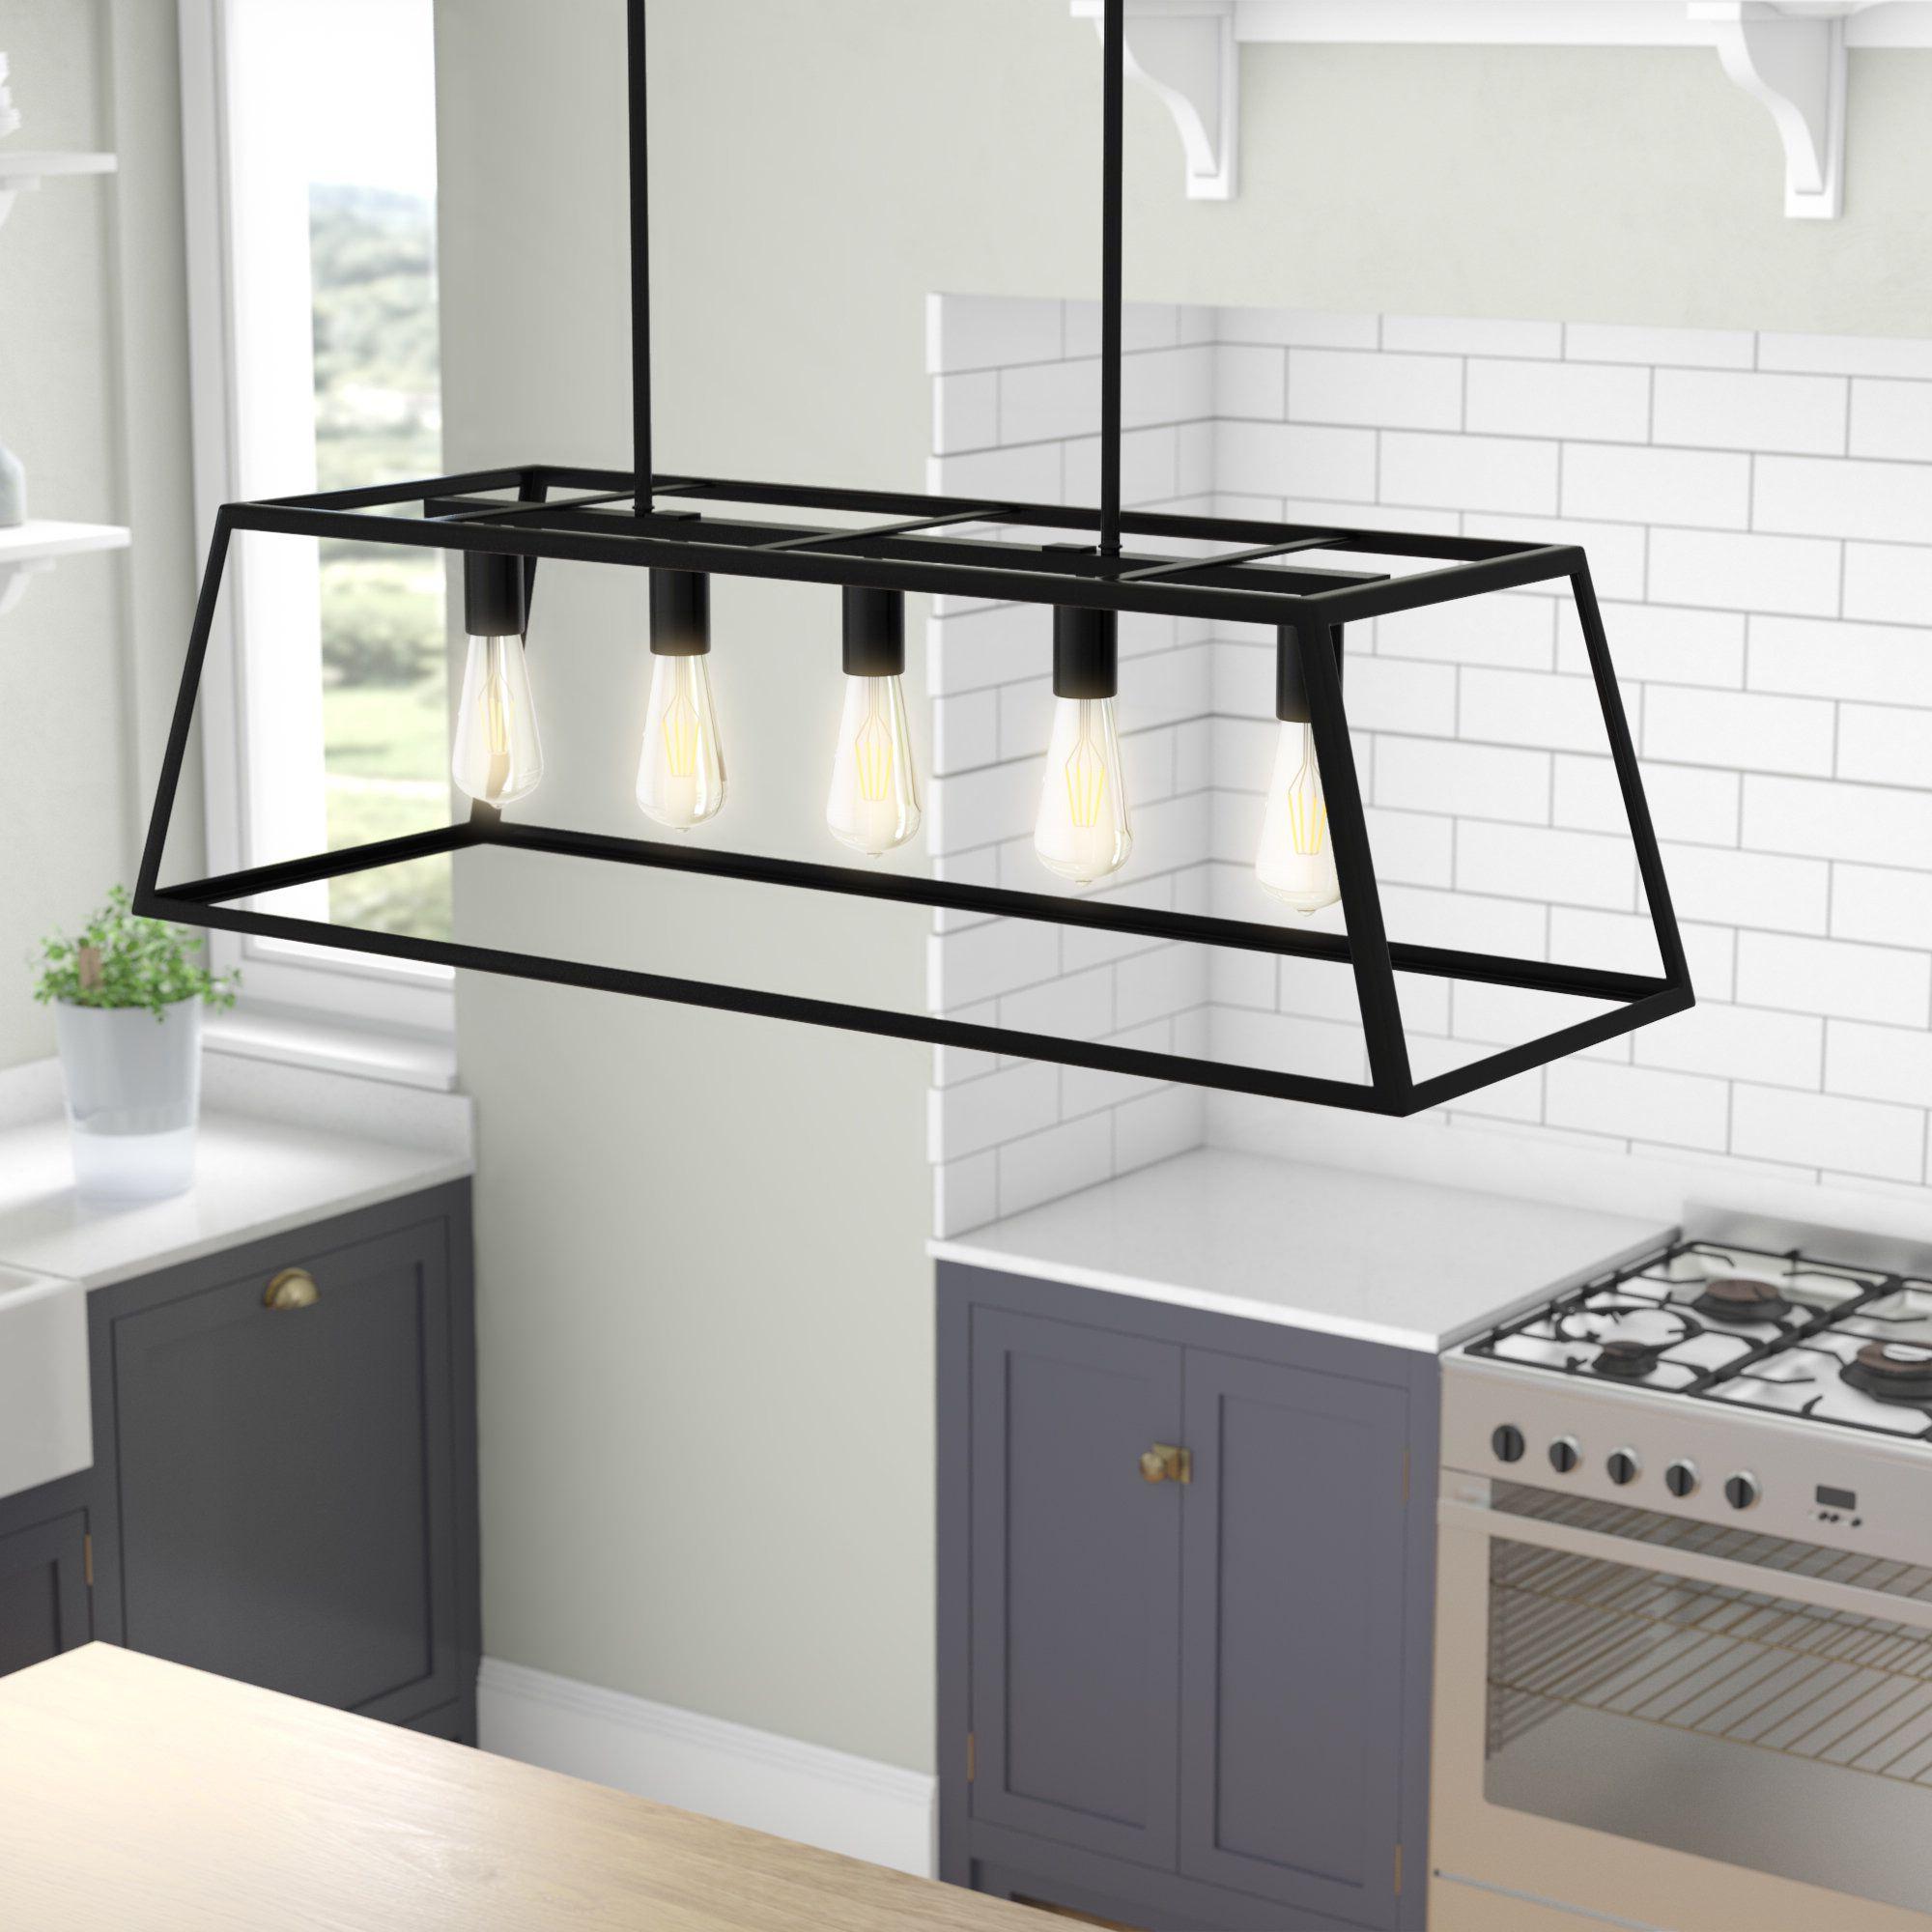 Best and Newest Jefferson 4-Light Kitchen Island Linear Pendants regarding Wicklund 5-Light Kitchen Island Pendant